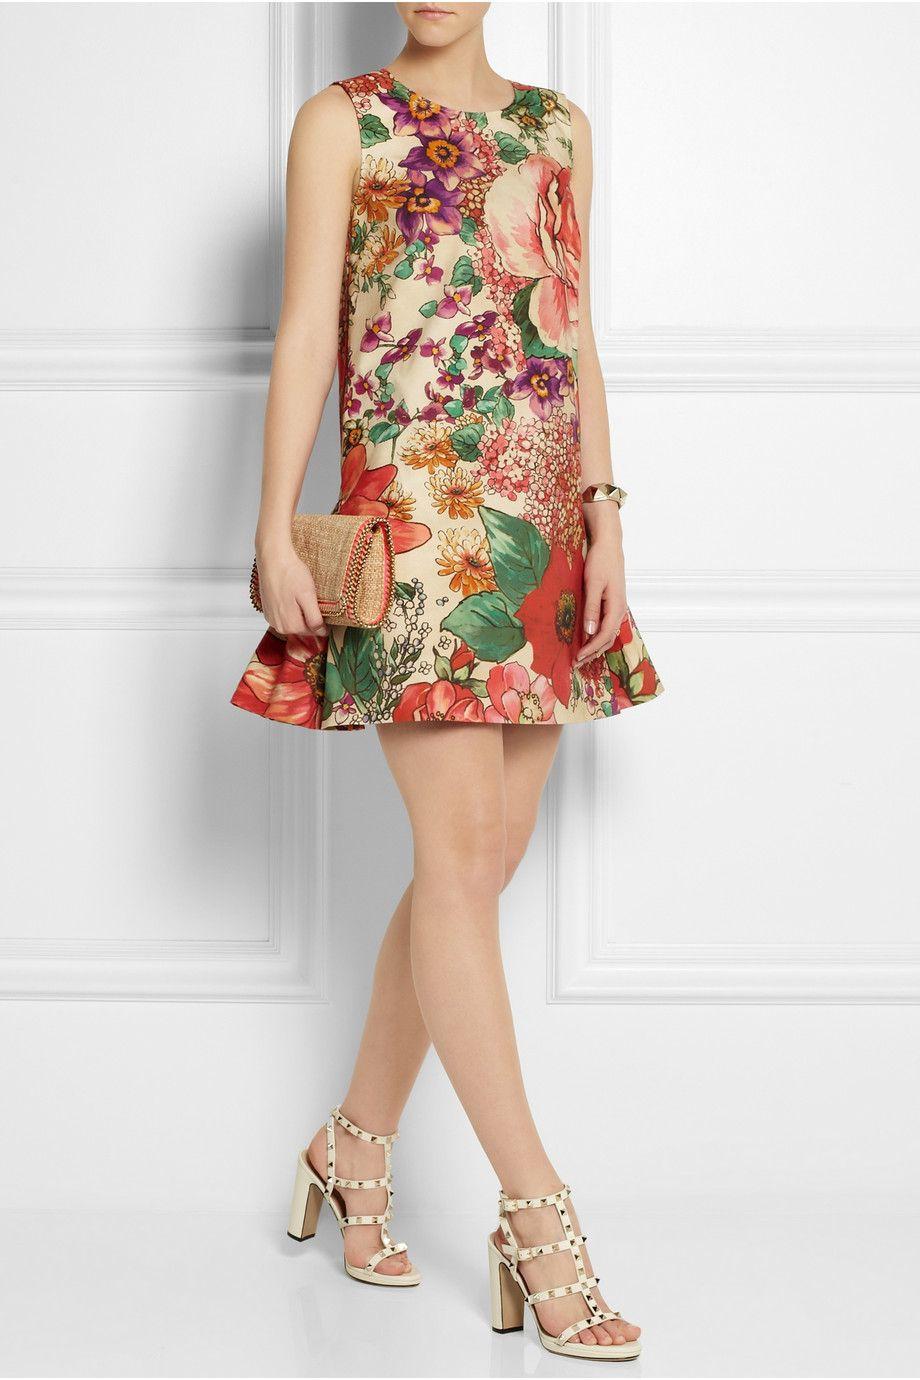 REDValentino - Floral-print cotton mini dress